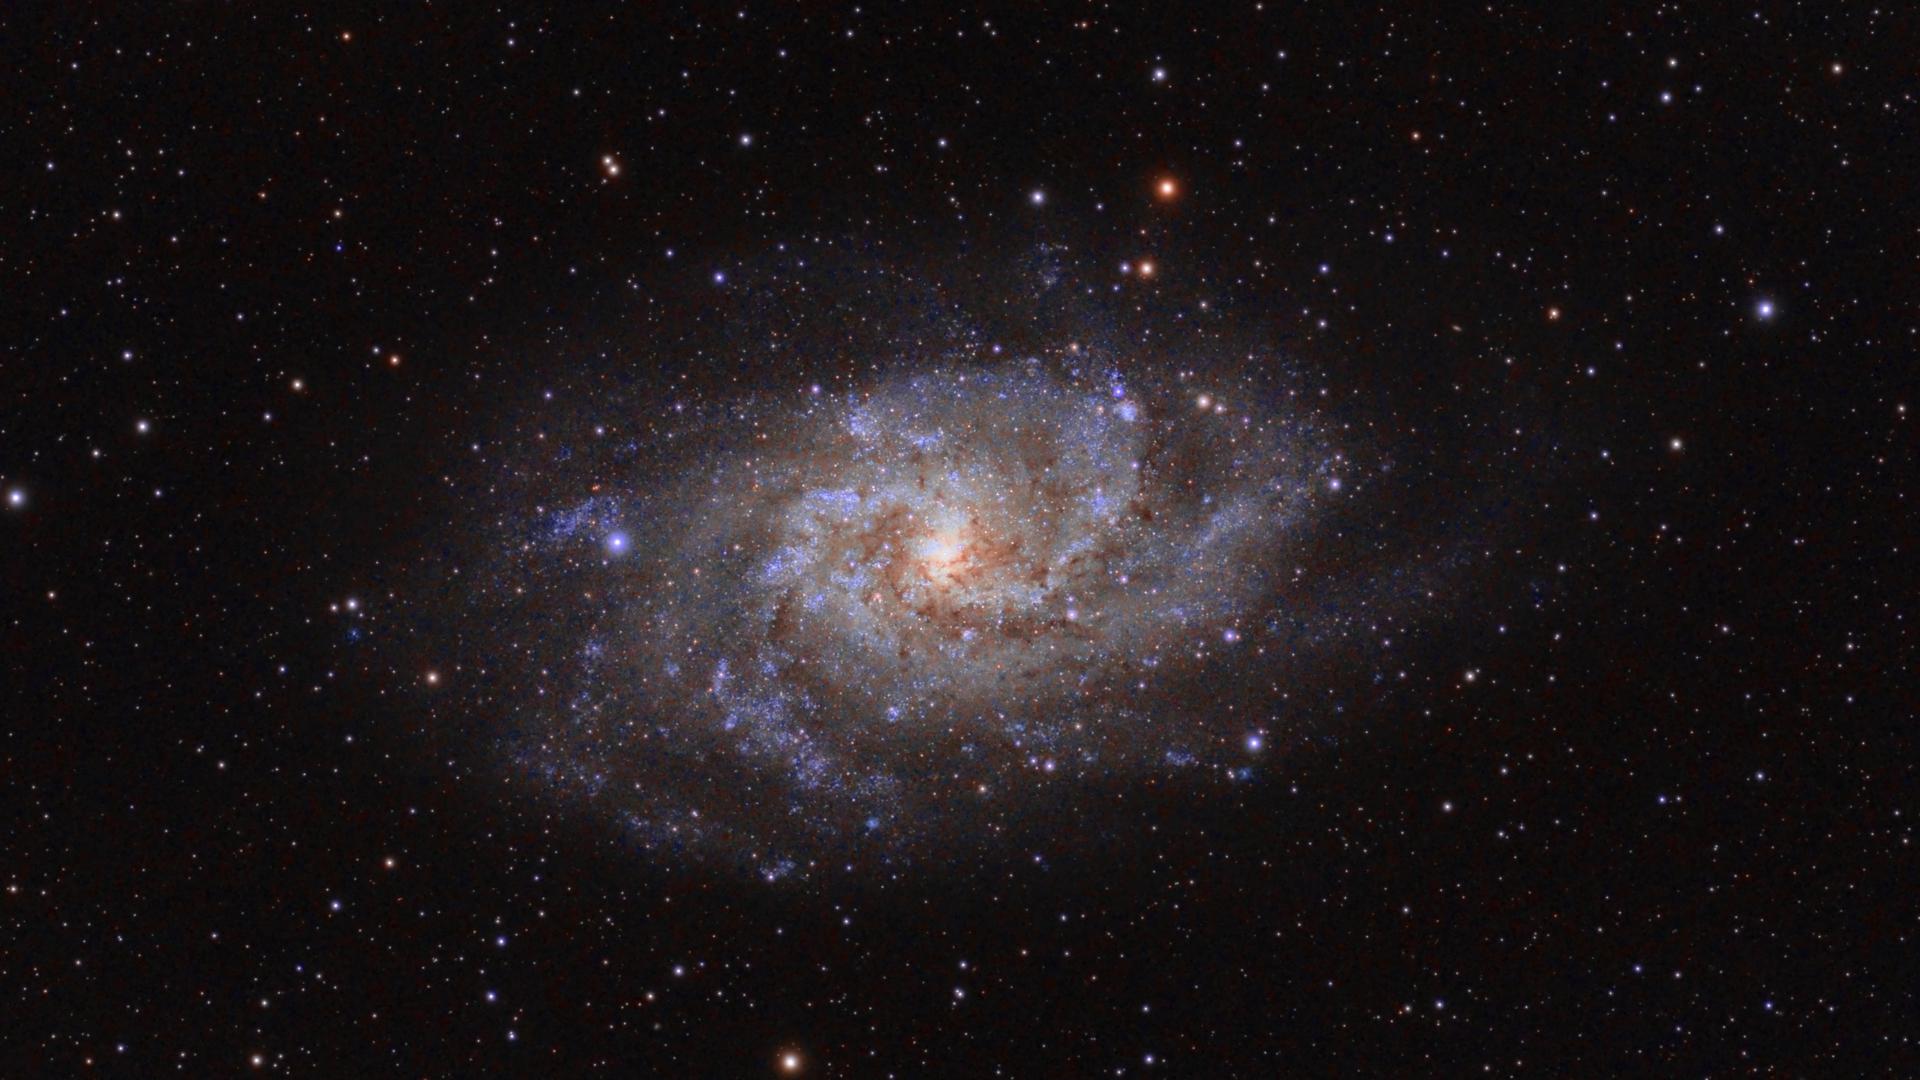 M33_2020_1080.jpg